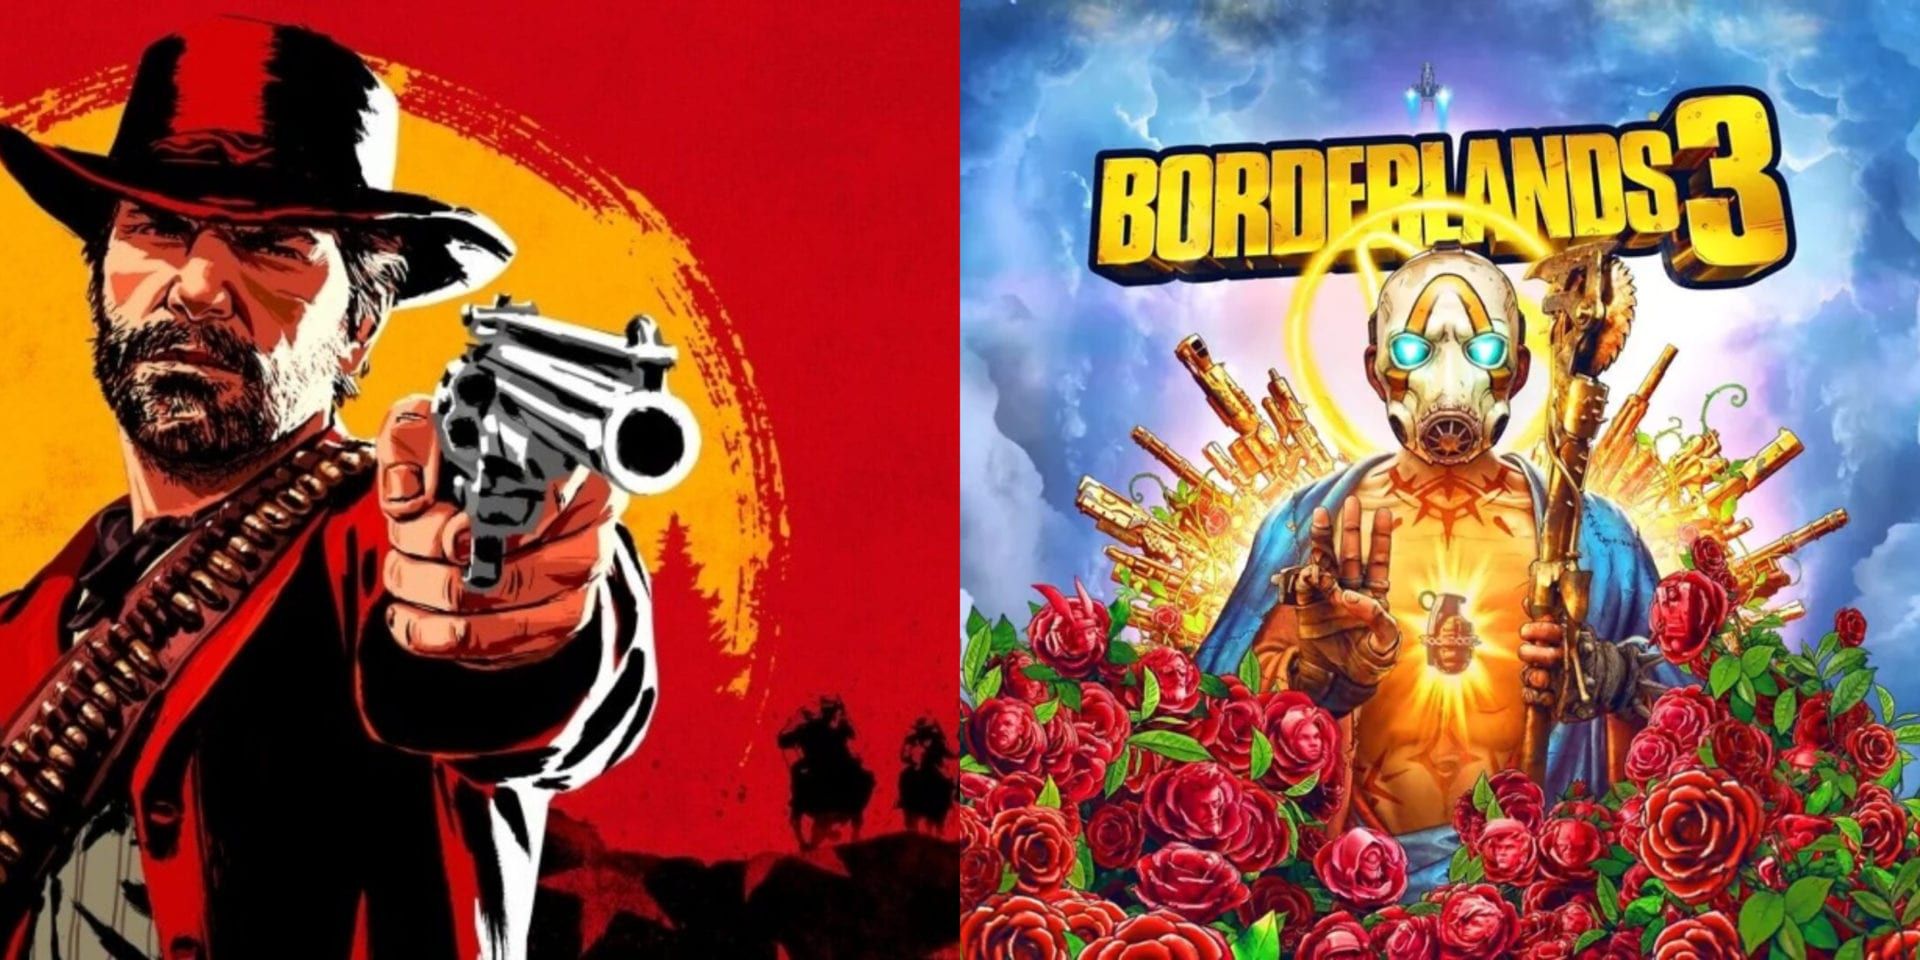 borderlands 3 red dead redemption 2, sales, take-two